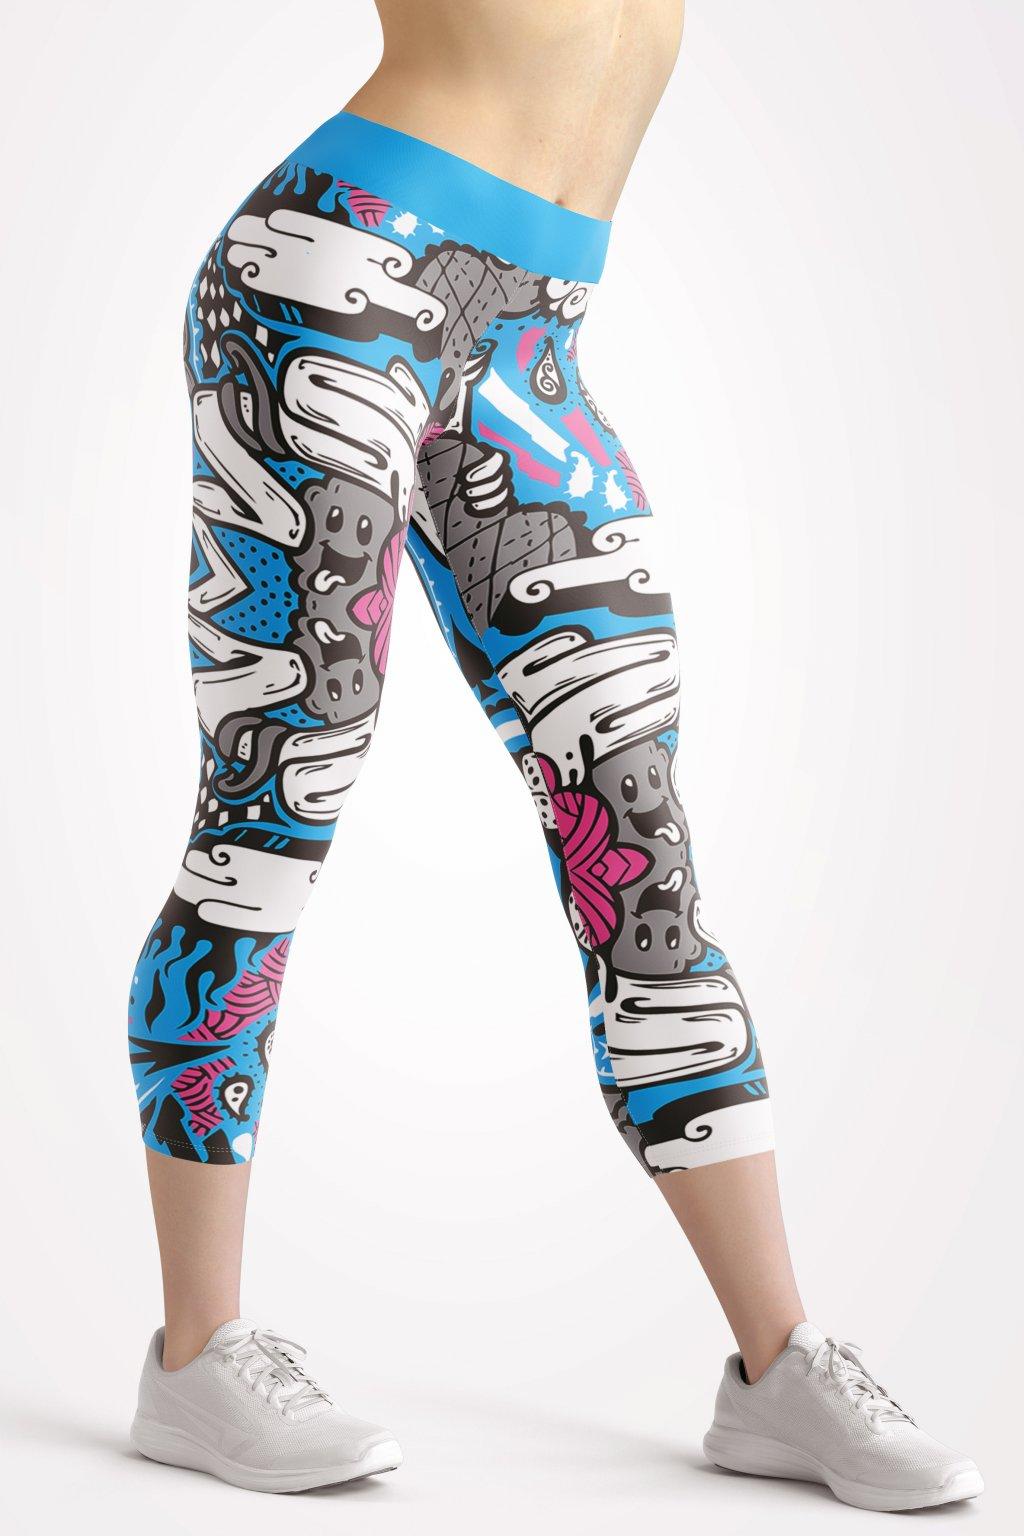 toon hype 3 4 leggings front by utopy